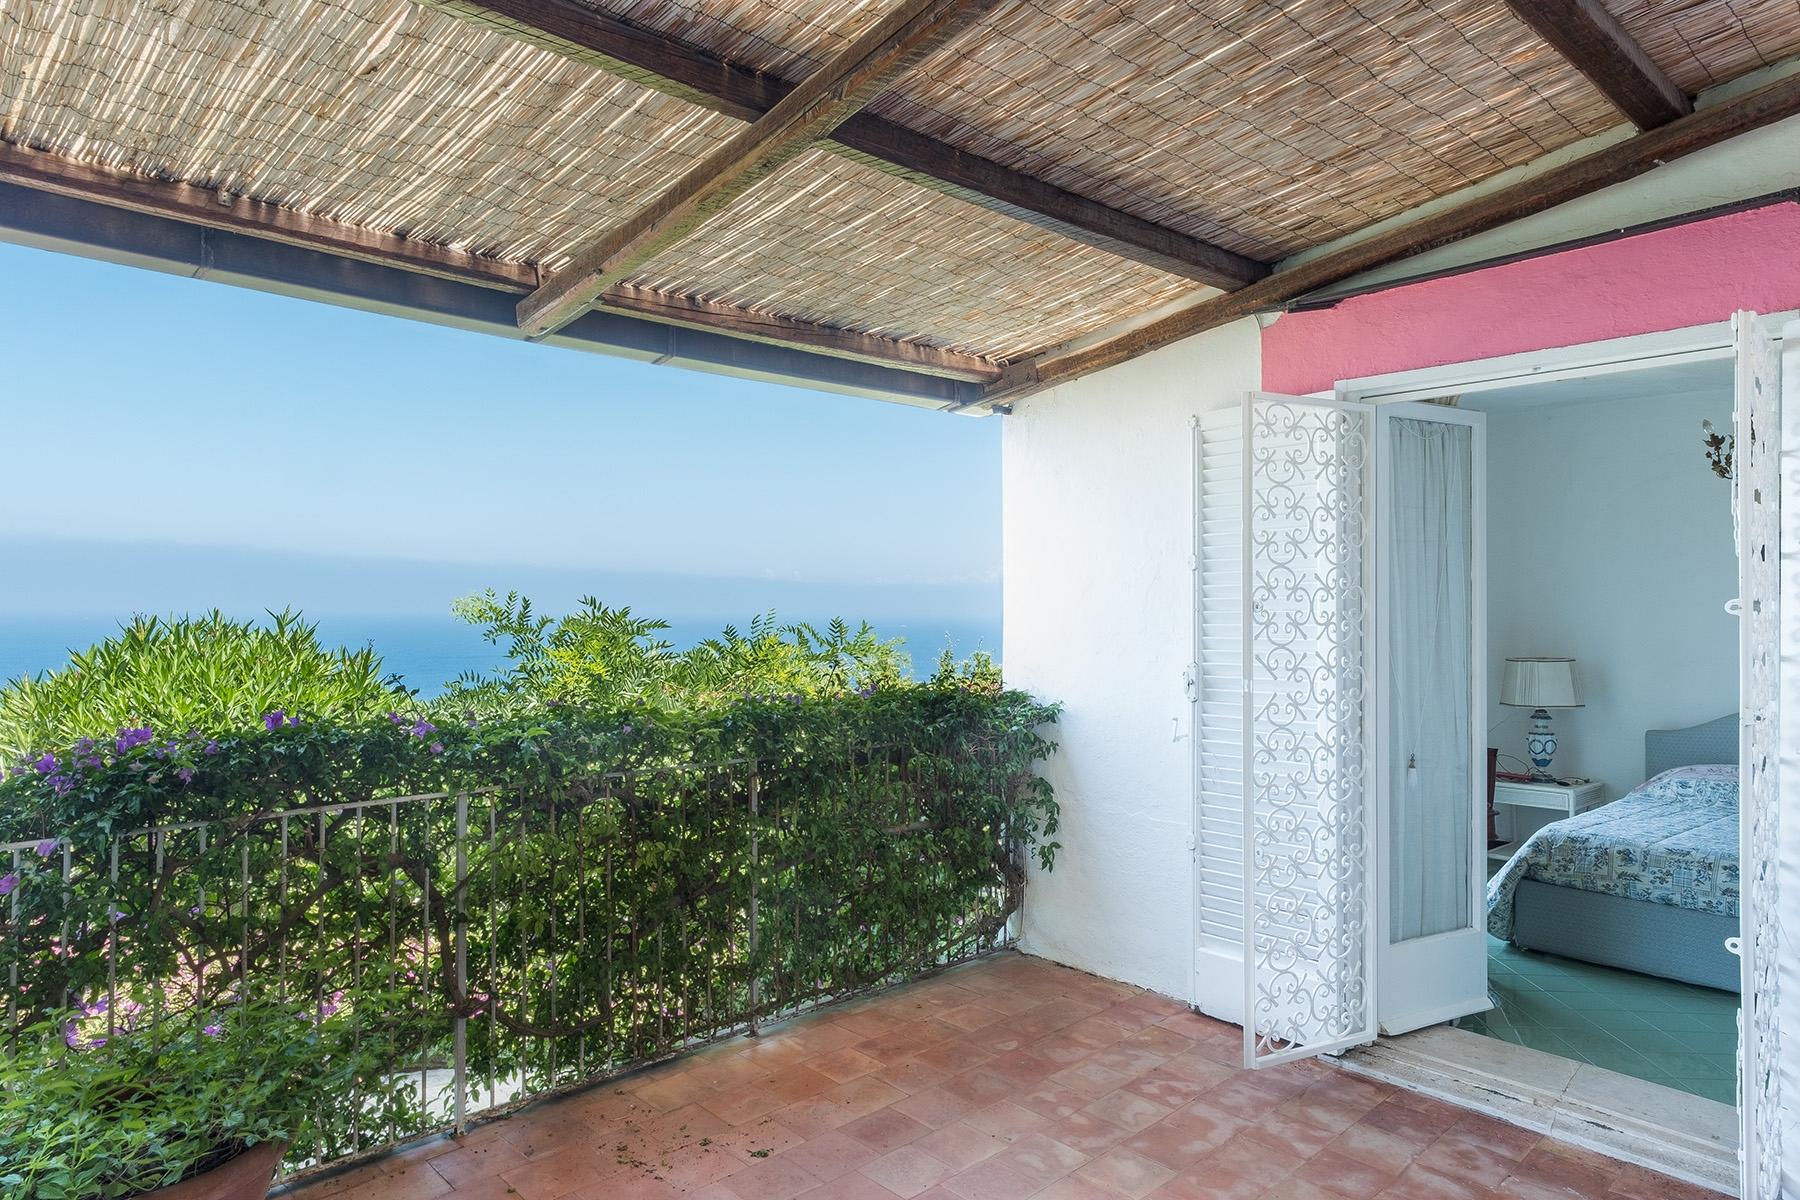 Villa in Vendita a Ischia: 5 locali, 206 mq - Foto 18